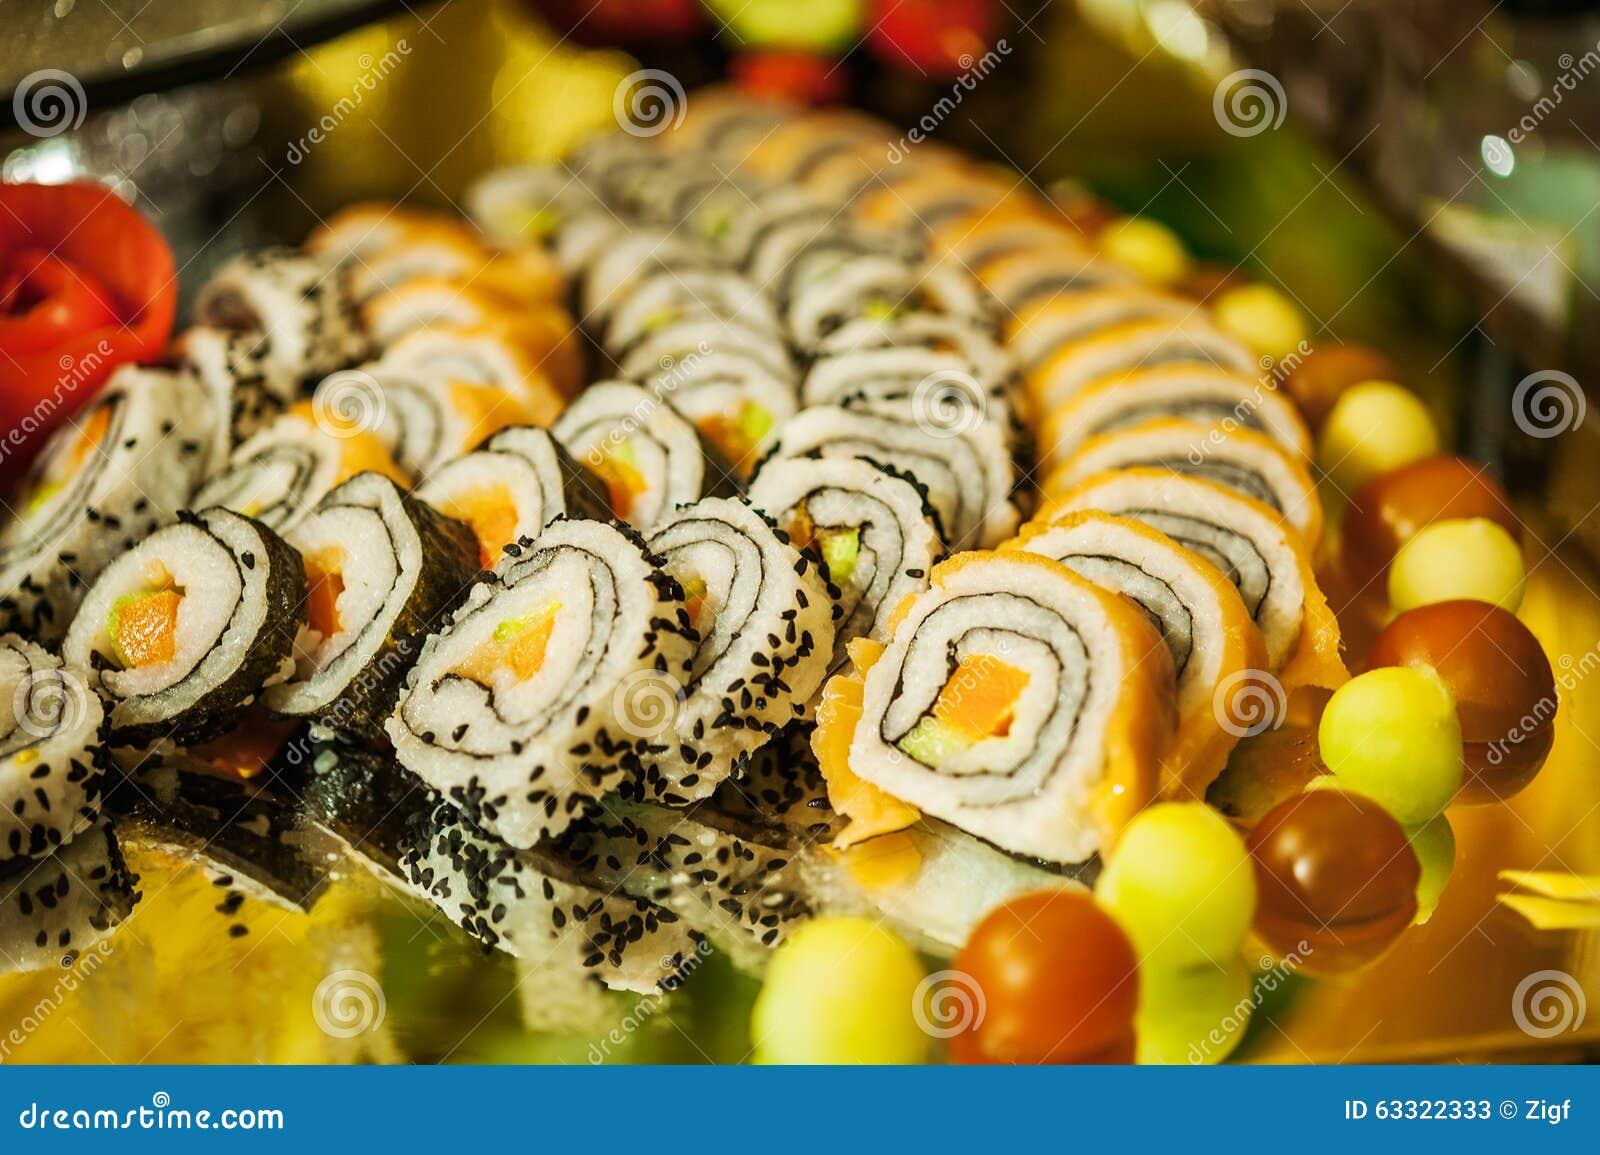 Vegetable rolls